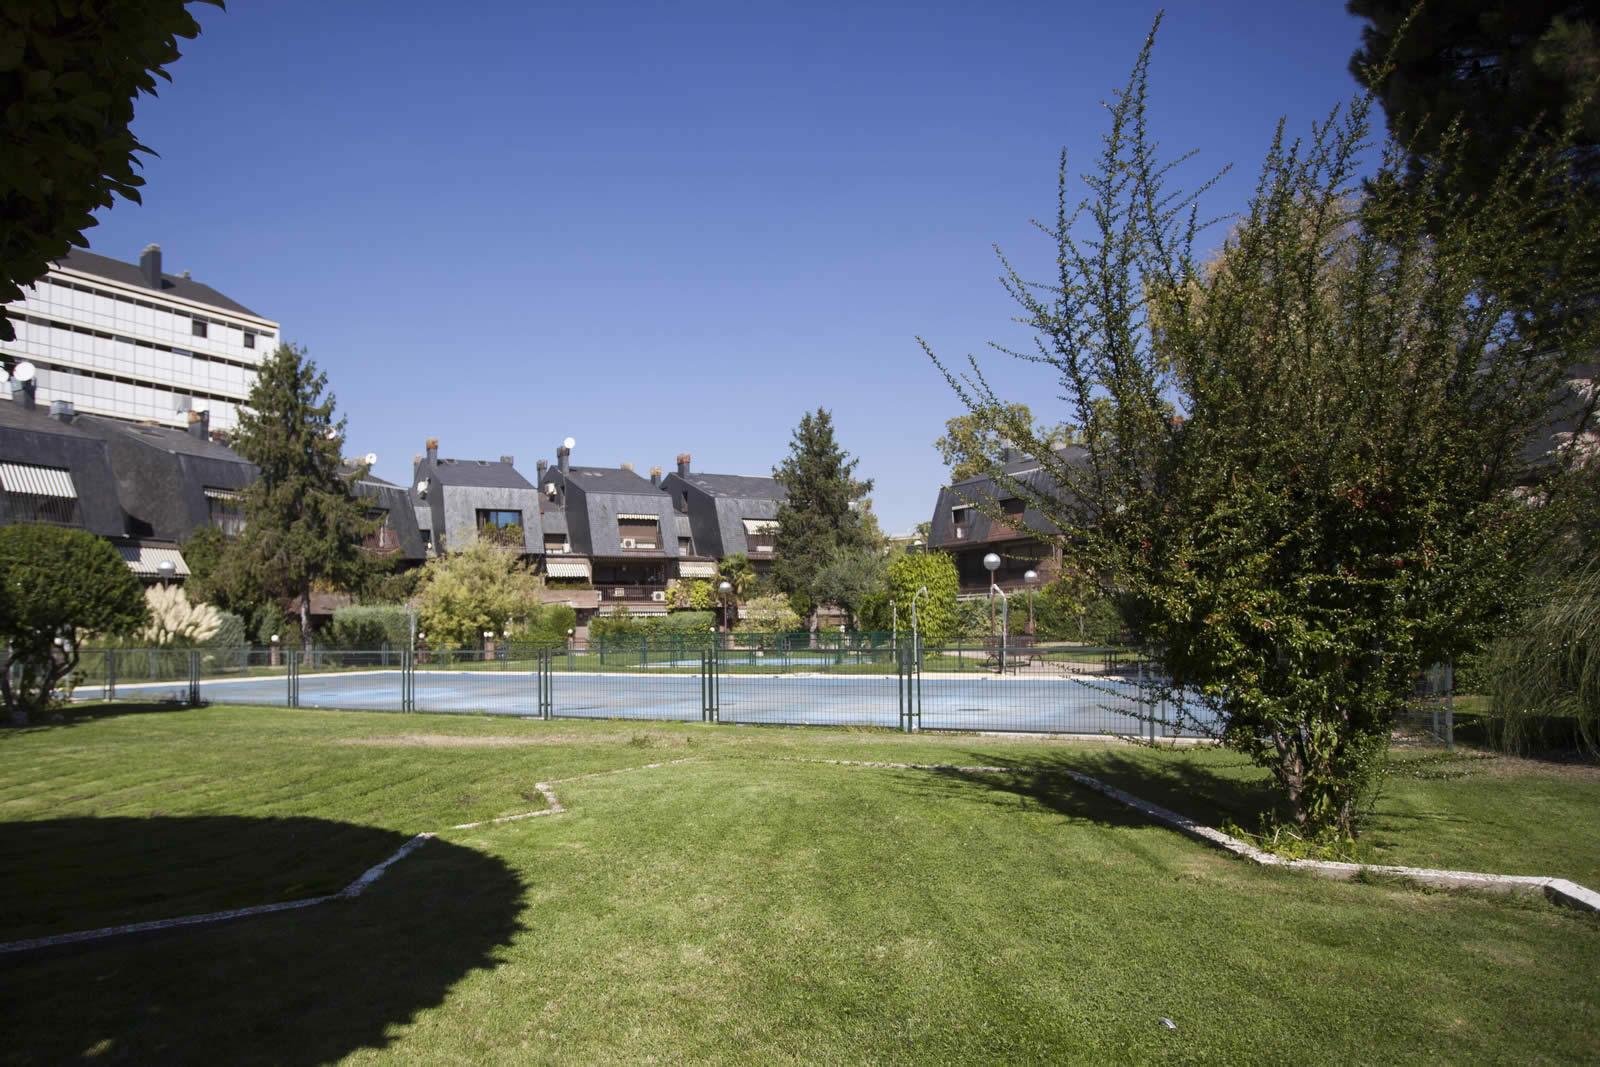 chalet-piscine-jardin-cave-a-vin-vendre